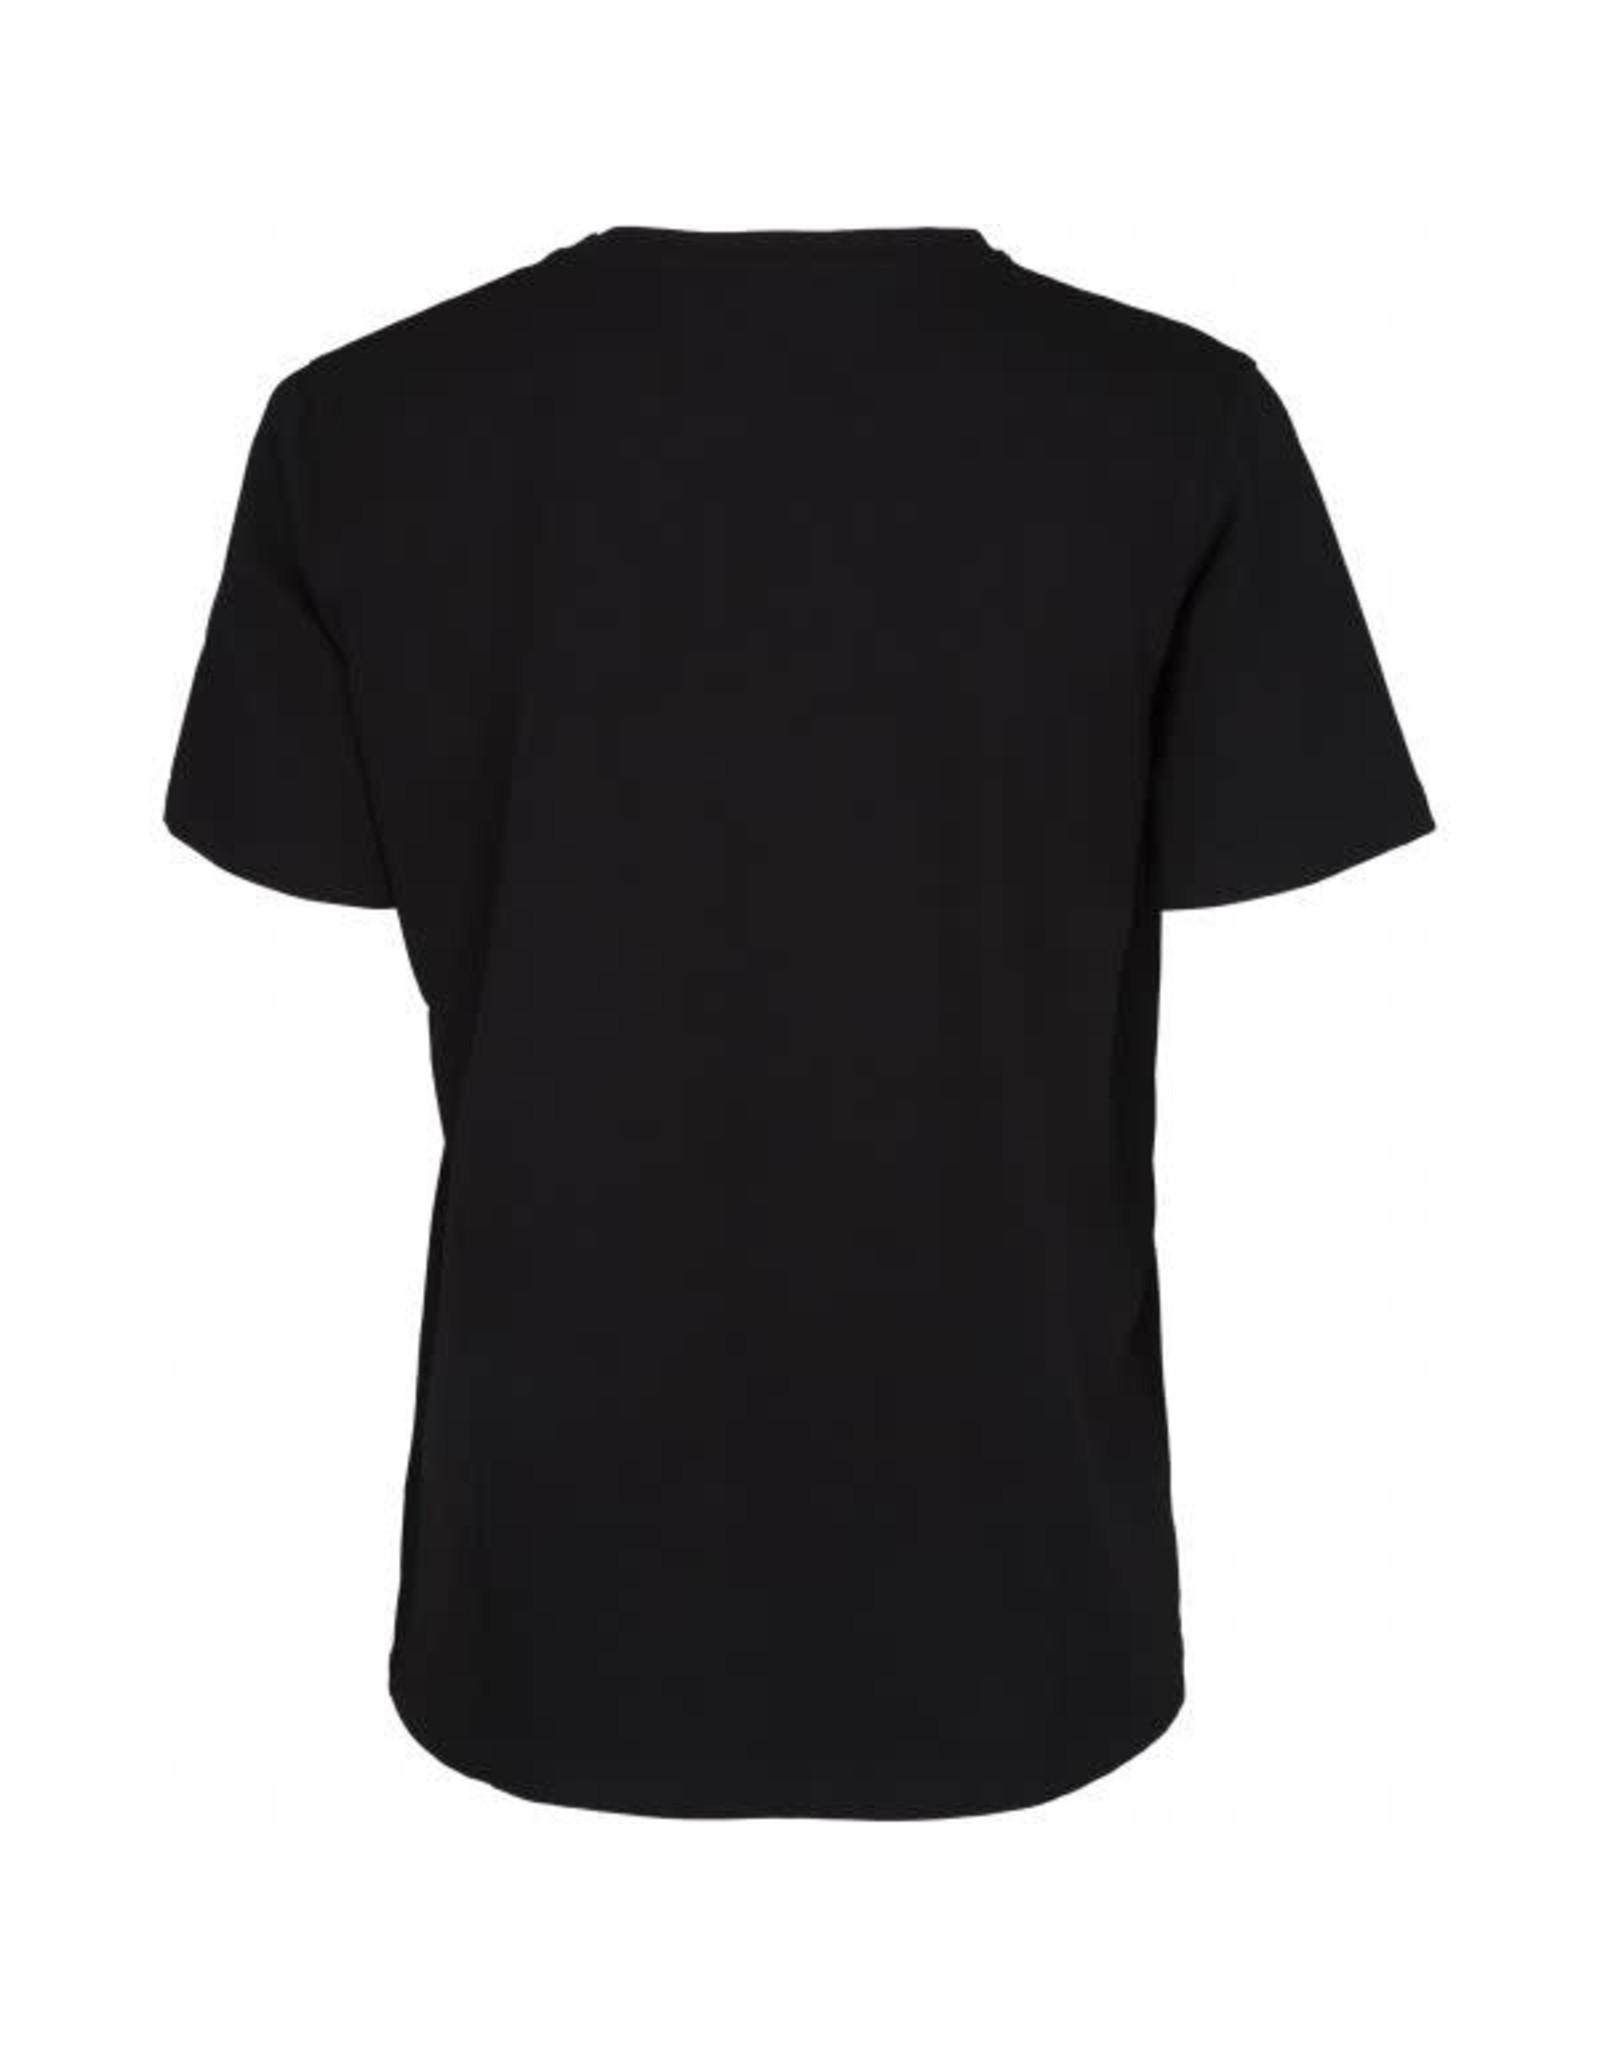 Minus Naya T Shirt